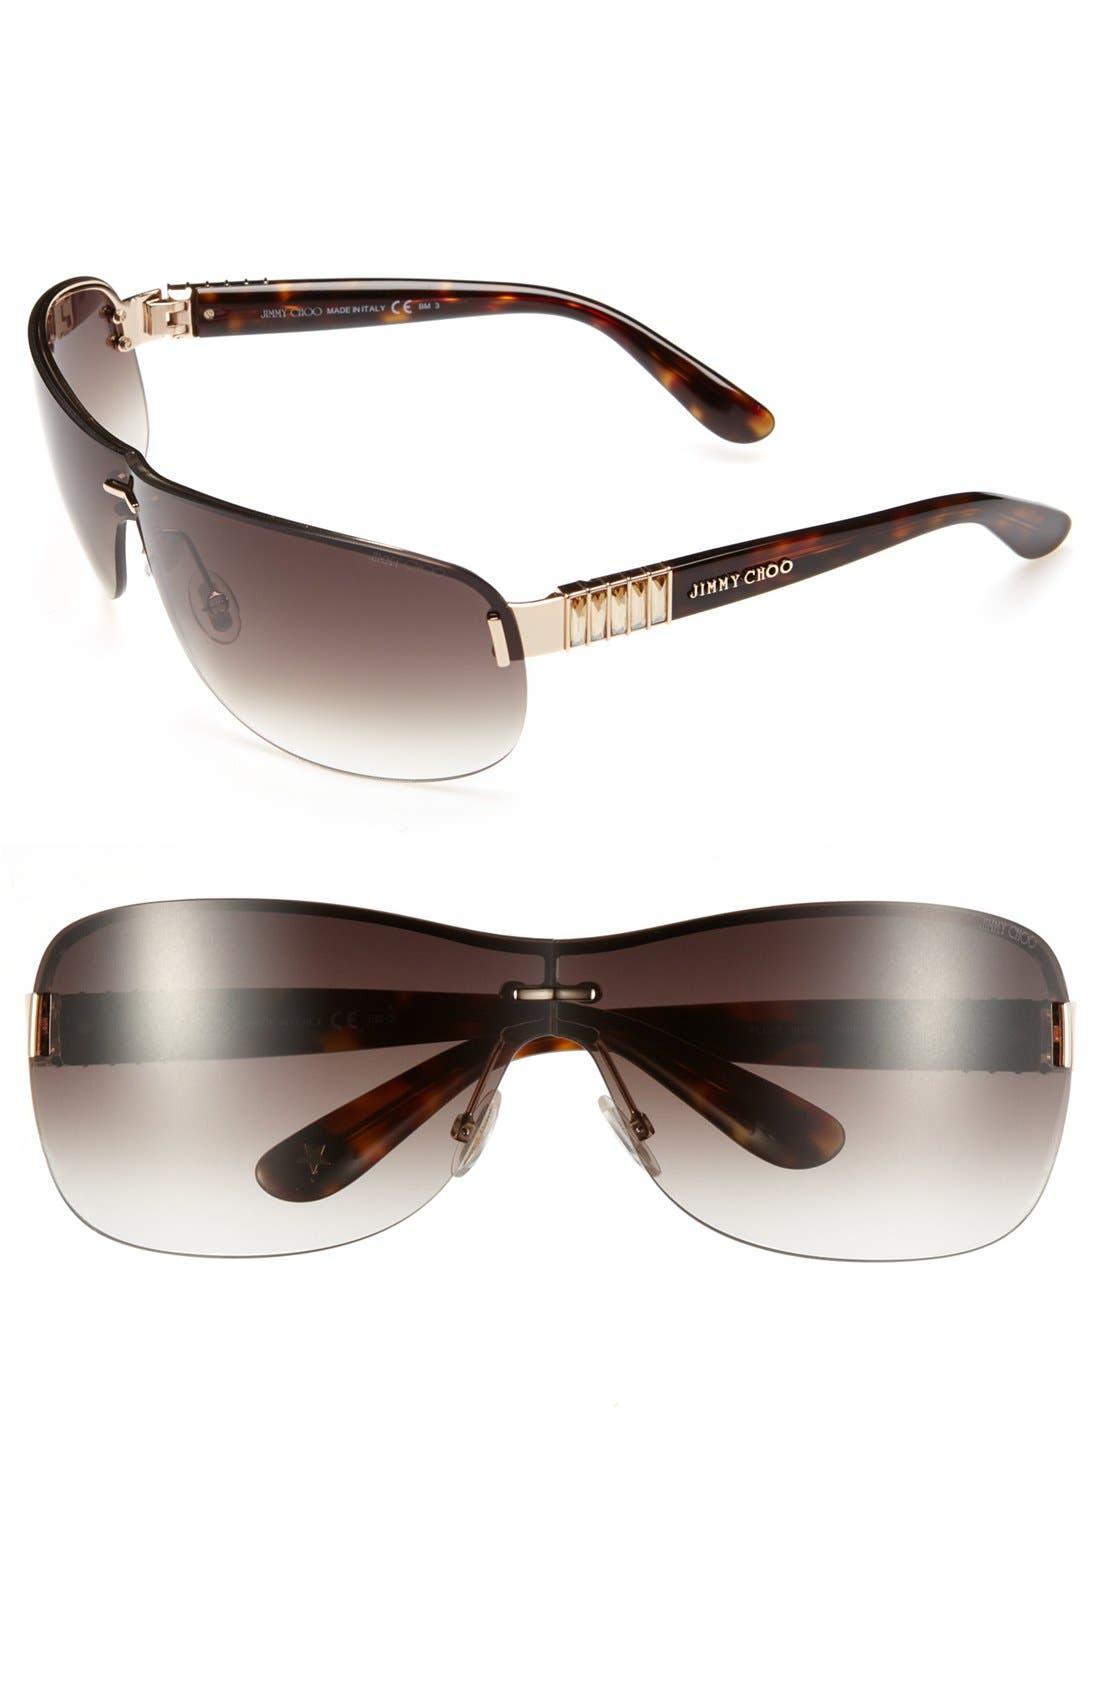 Alternate Image 1 Selected - Jimmy Choo 'Flo' 76mm Sunglasses